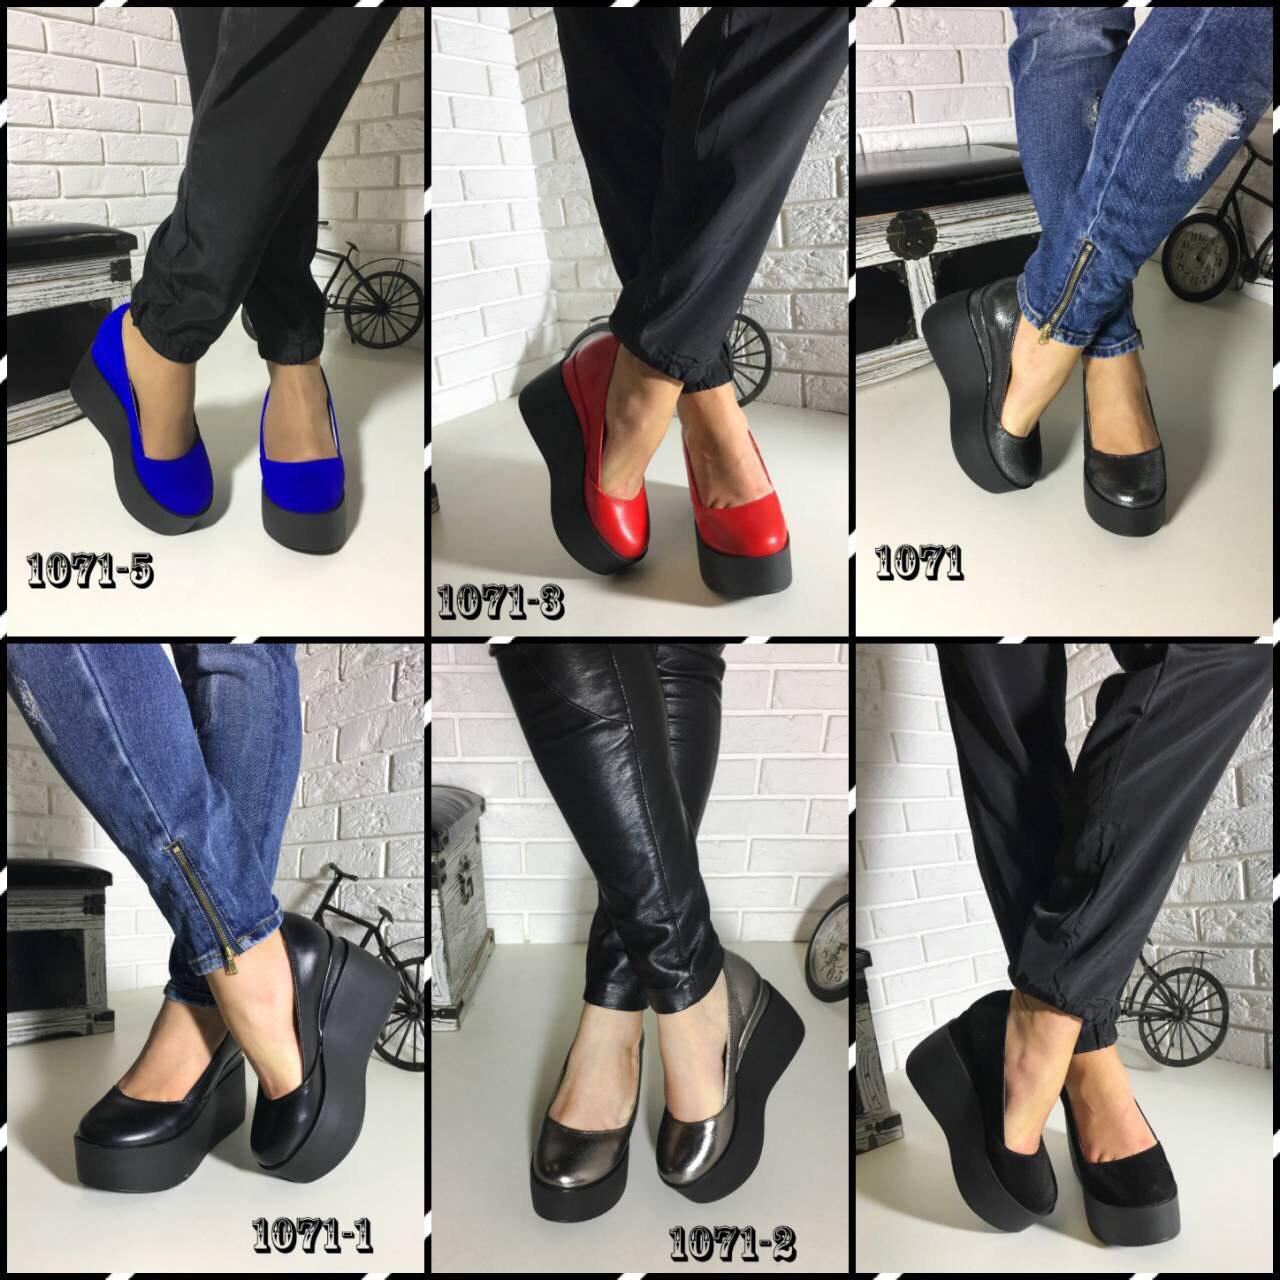 223b1f710 Женские туфли на танкетке/платформе натуральная замша/натуральная кожа